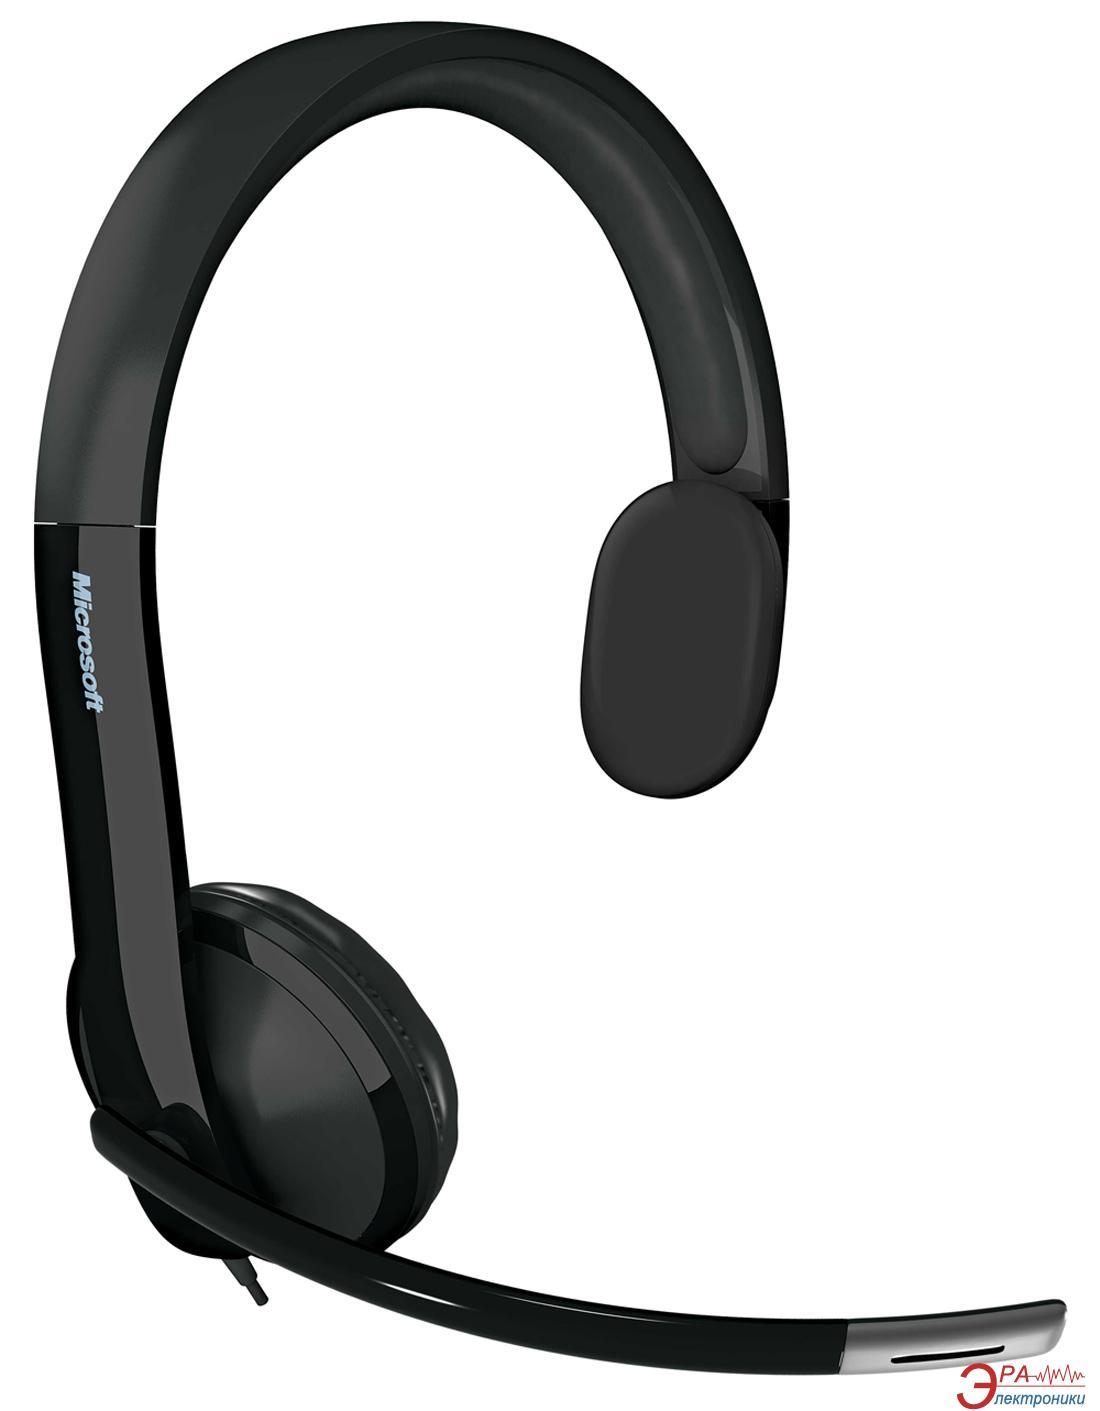 Гарнитура Microsoft LifeChat LX-4000 USB Ret black (7YF-00001)